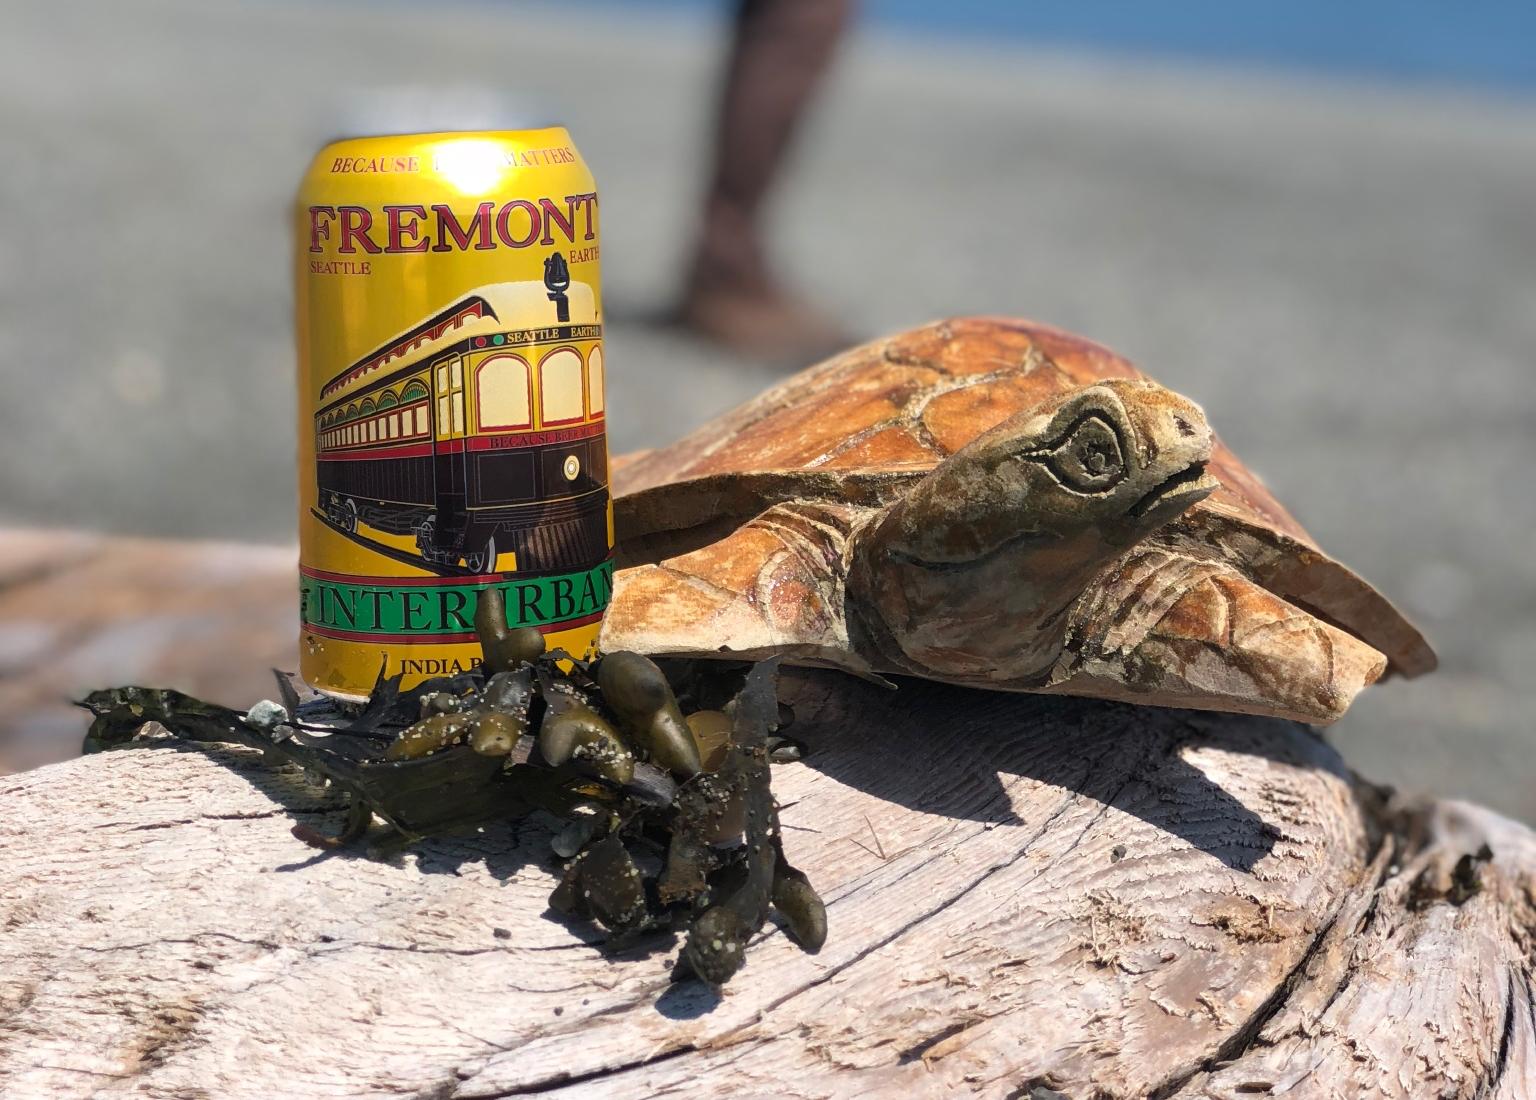 PNW Craft Beer Tasting & Kayaking Tour | Outdoor Odysseys